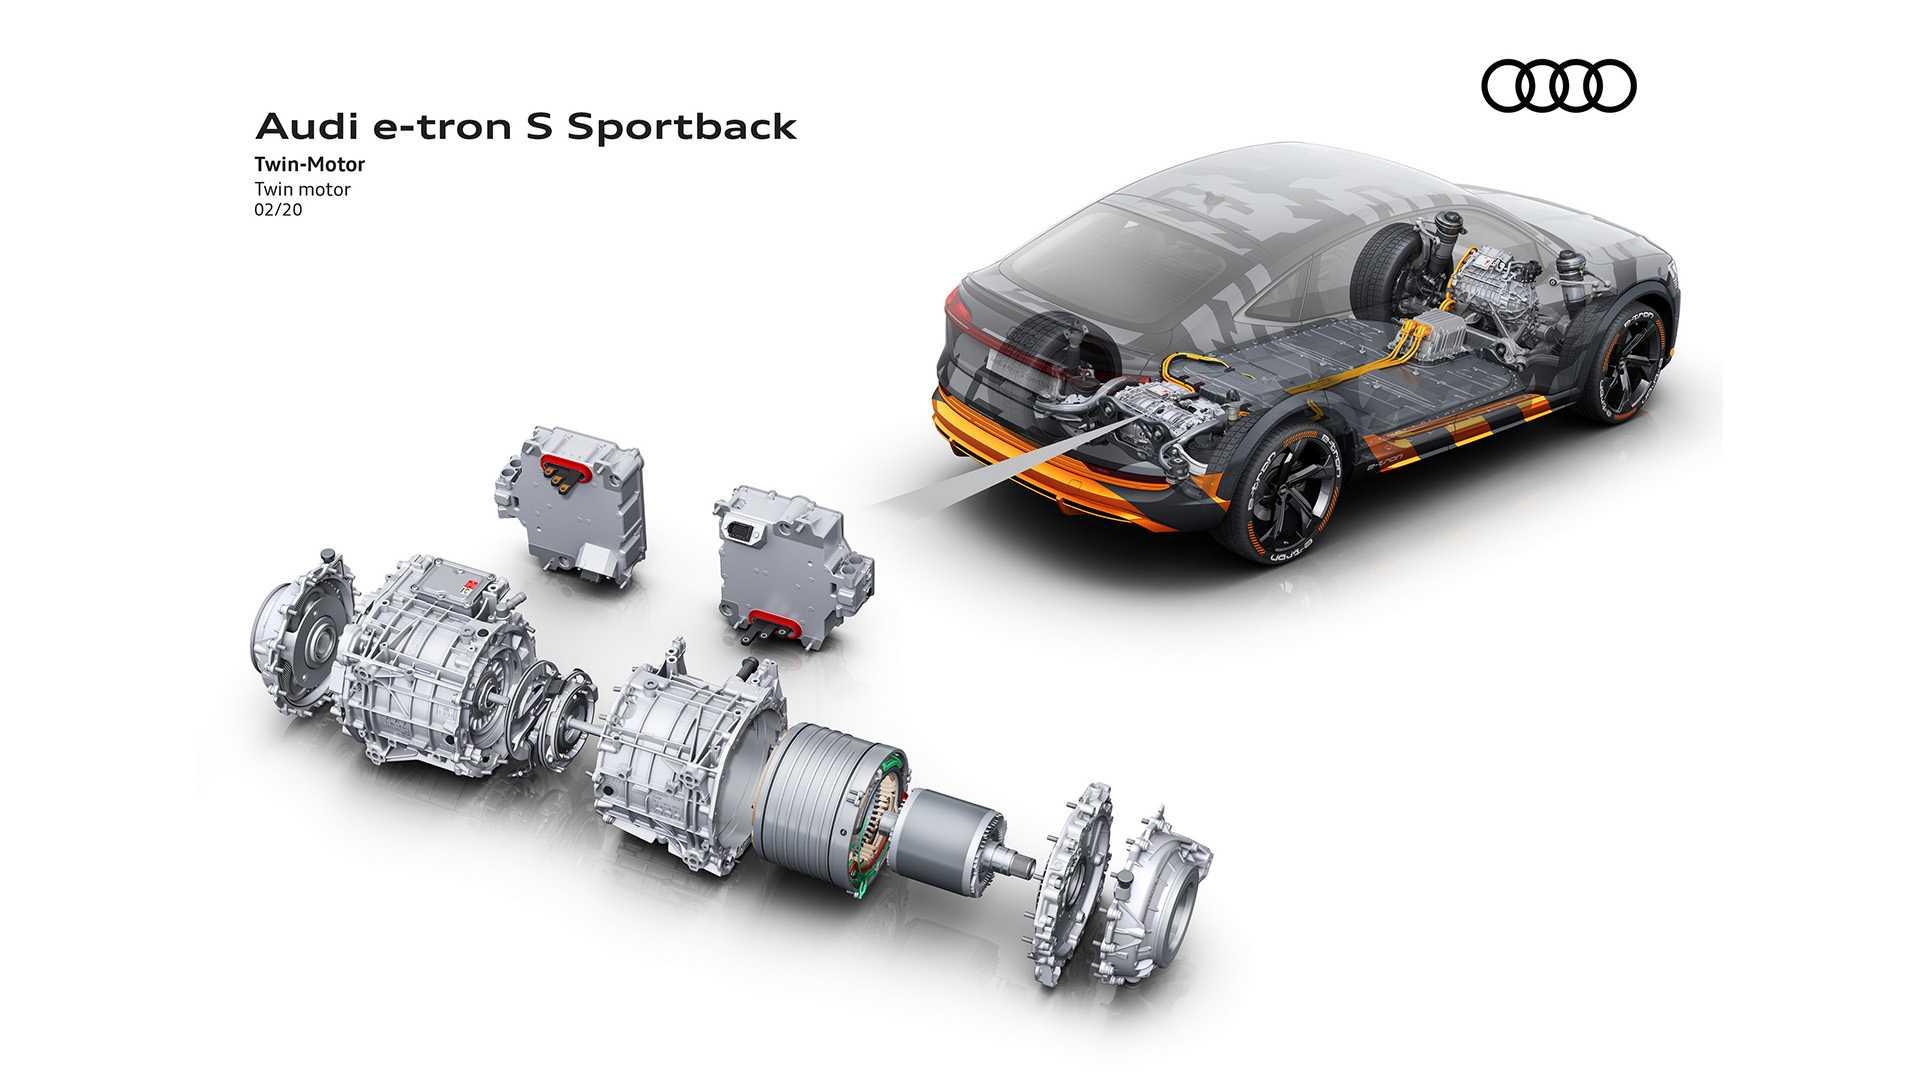 2020_Audi_e-tron_S_0058